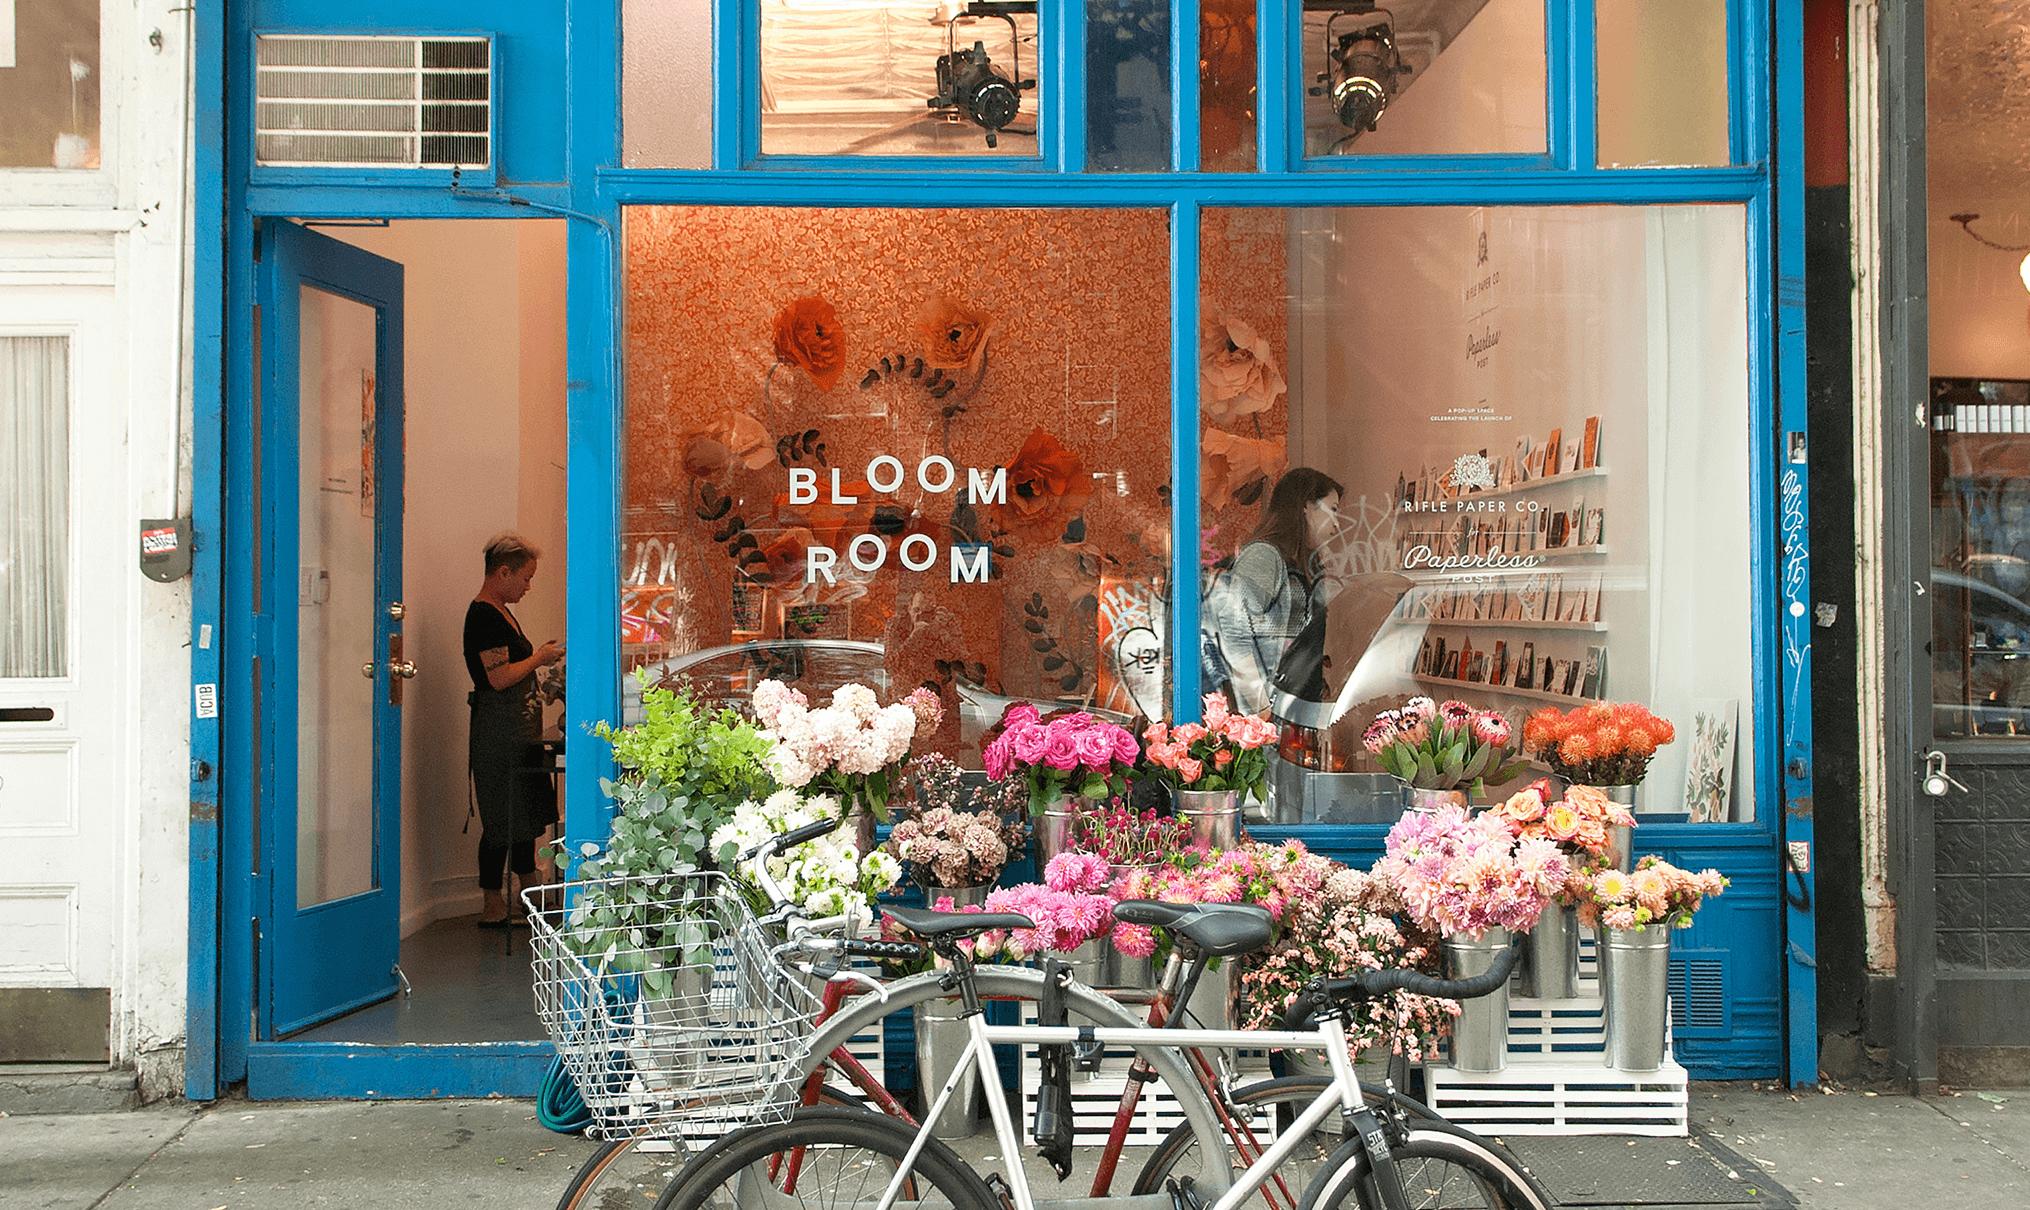 BloomRoom_LargeInset_Exterior_2030x1210